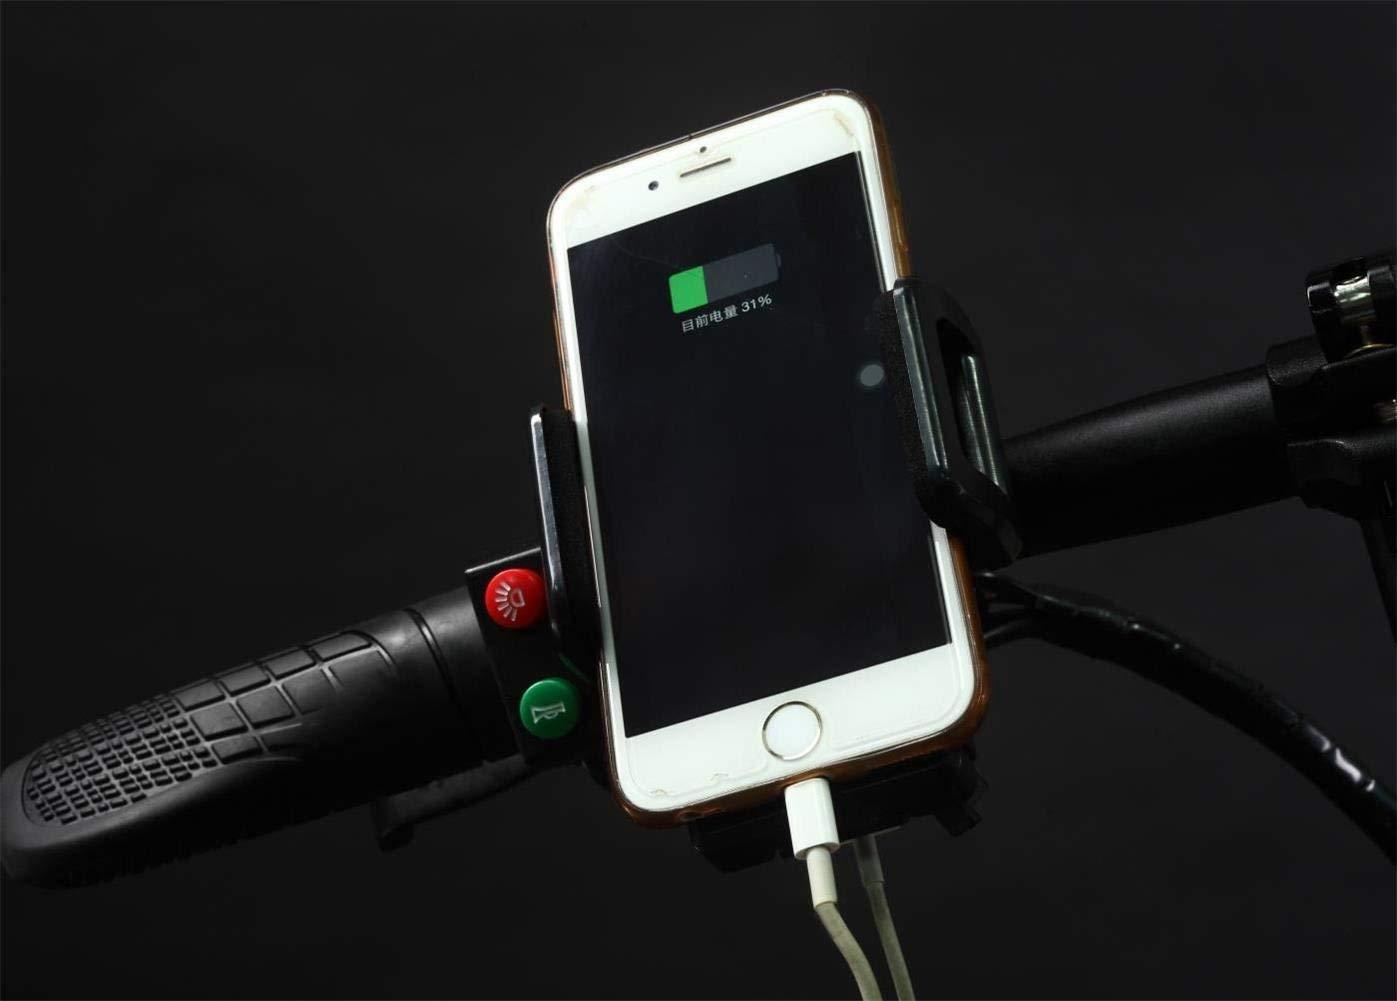 RICH BIT RT730 Bicicleta el/éctrica plegable de 20 pulgadas amortiguadores de choque completos 7 velocidades de simano con opci/& marco de aleaci/ón de aluminio mtb bater/ía de litio de 250 w * 8ah bicicleta el/éctrica pantalla